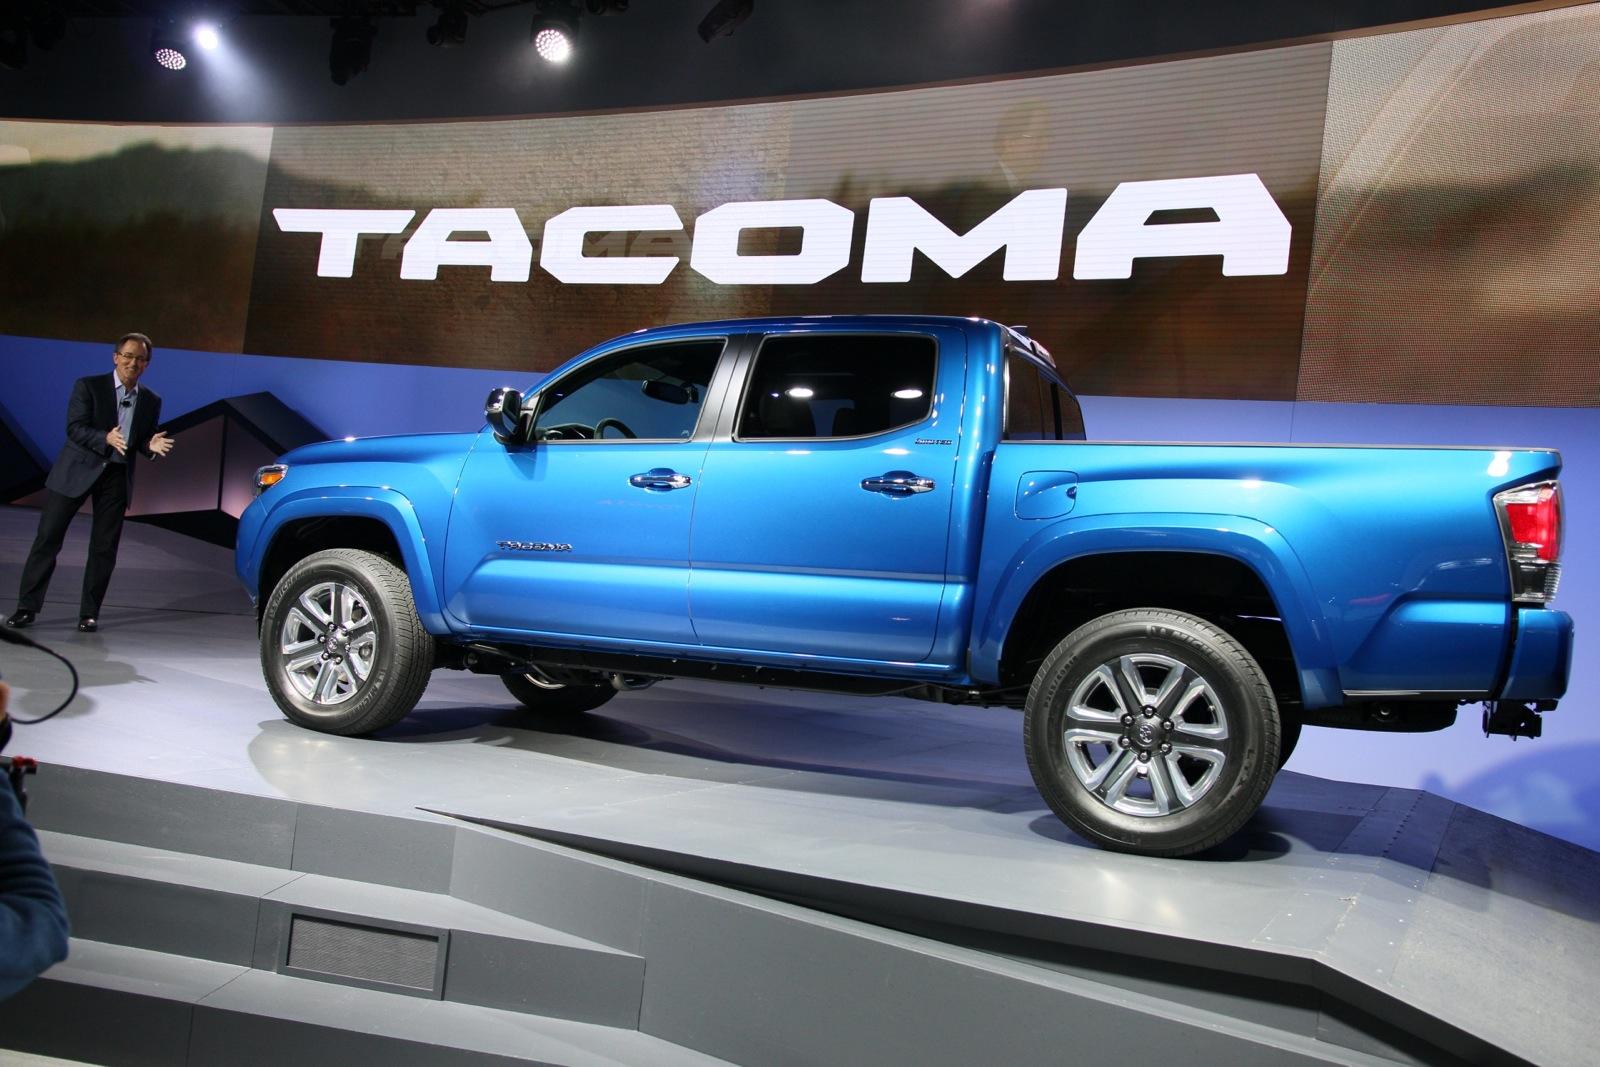 Toyota Tacoma Detroit